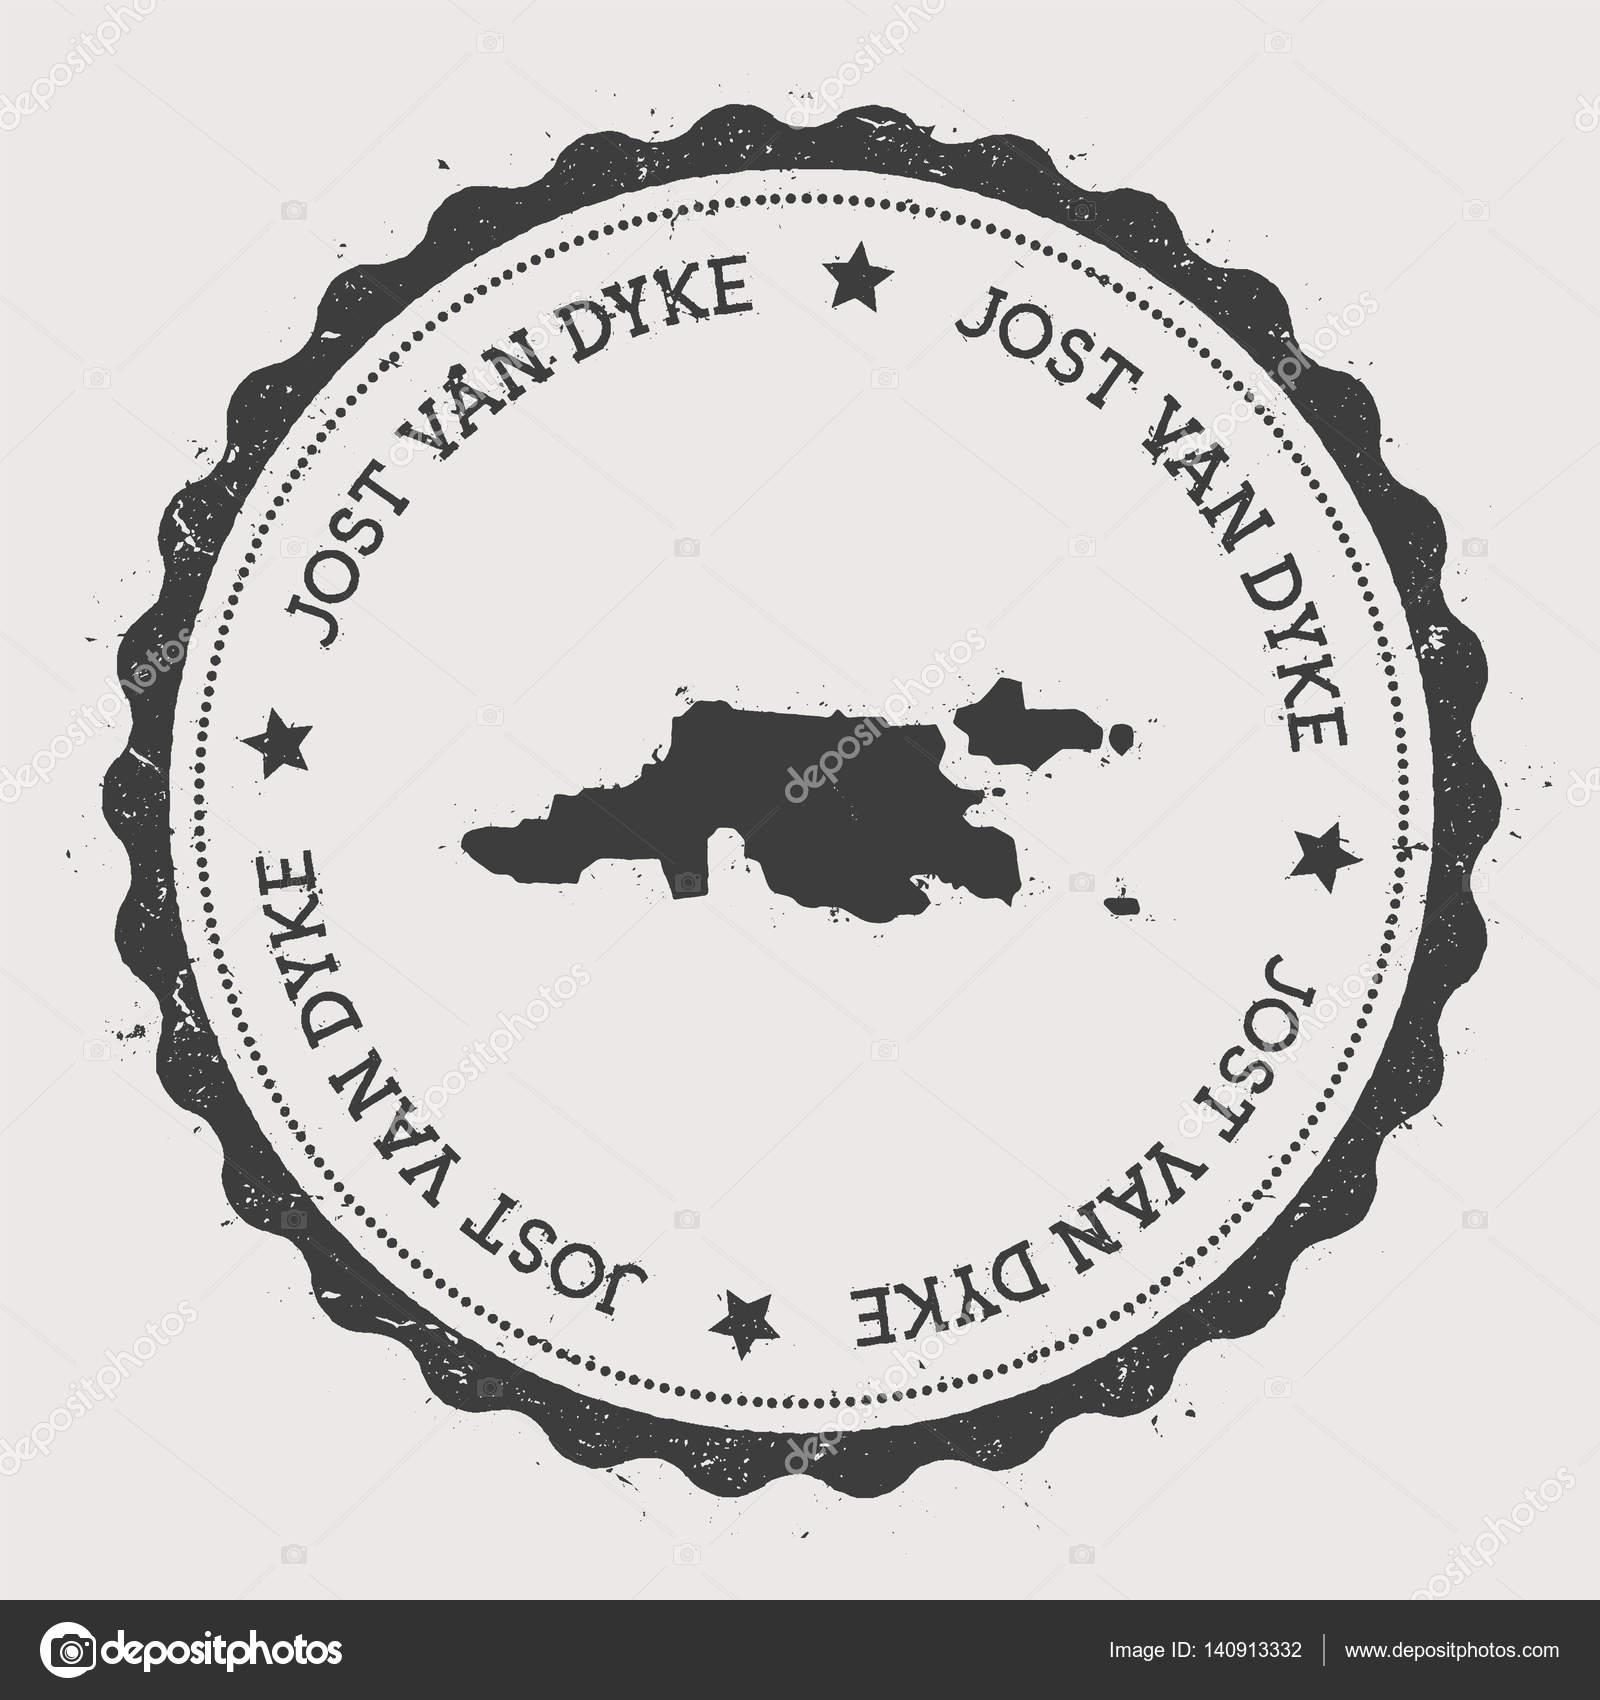 Jost Van Dyke sticker Hipster round rubber stamp with island map